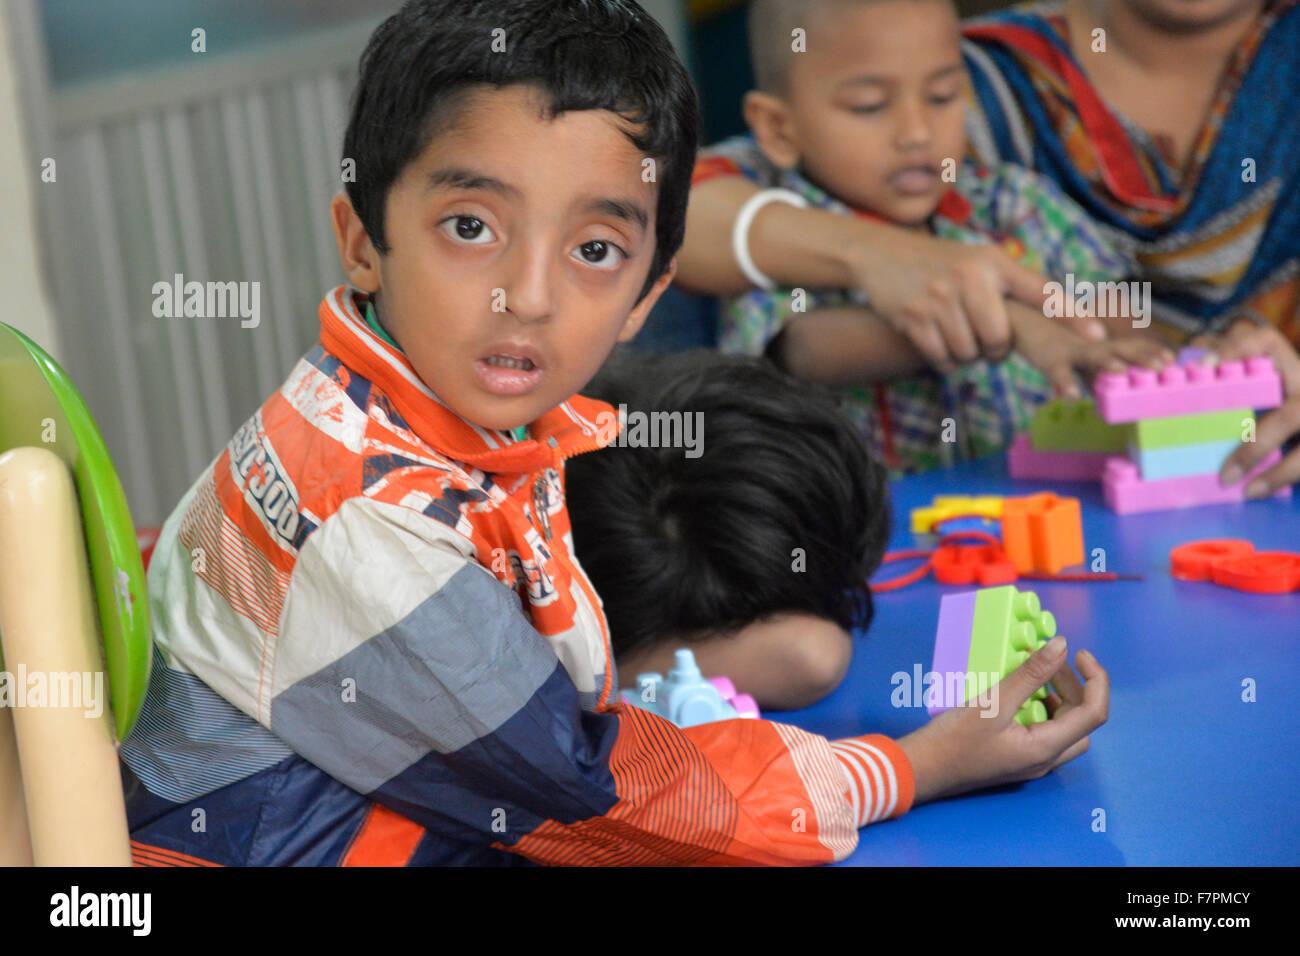 Bangladeshi Many Autistic Children Are Taking Speech And Language Therapy At Institute Of Paediatric Neurodisorder Autism In The Bangabandhu Sheikh